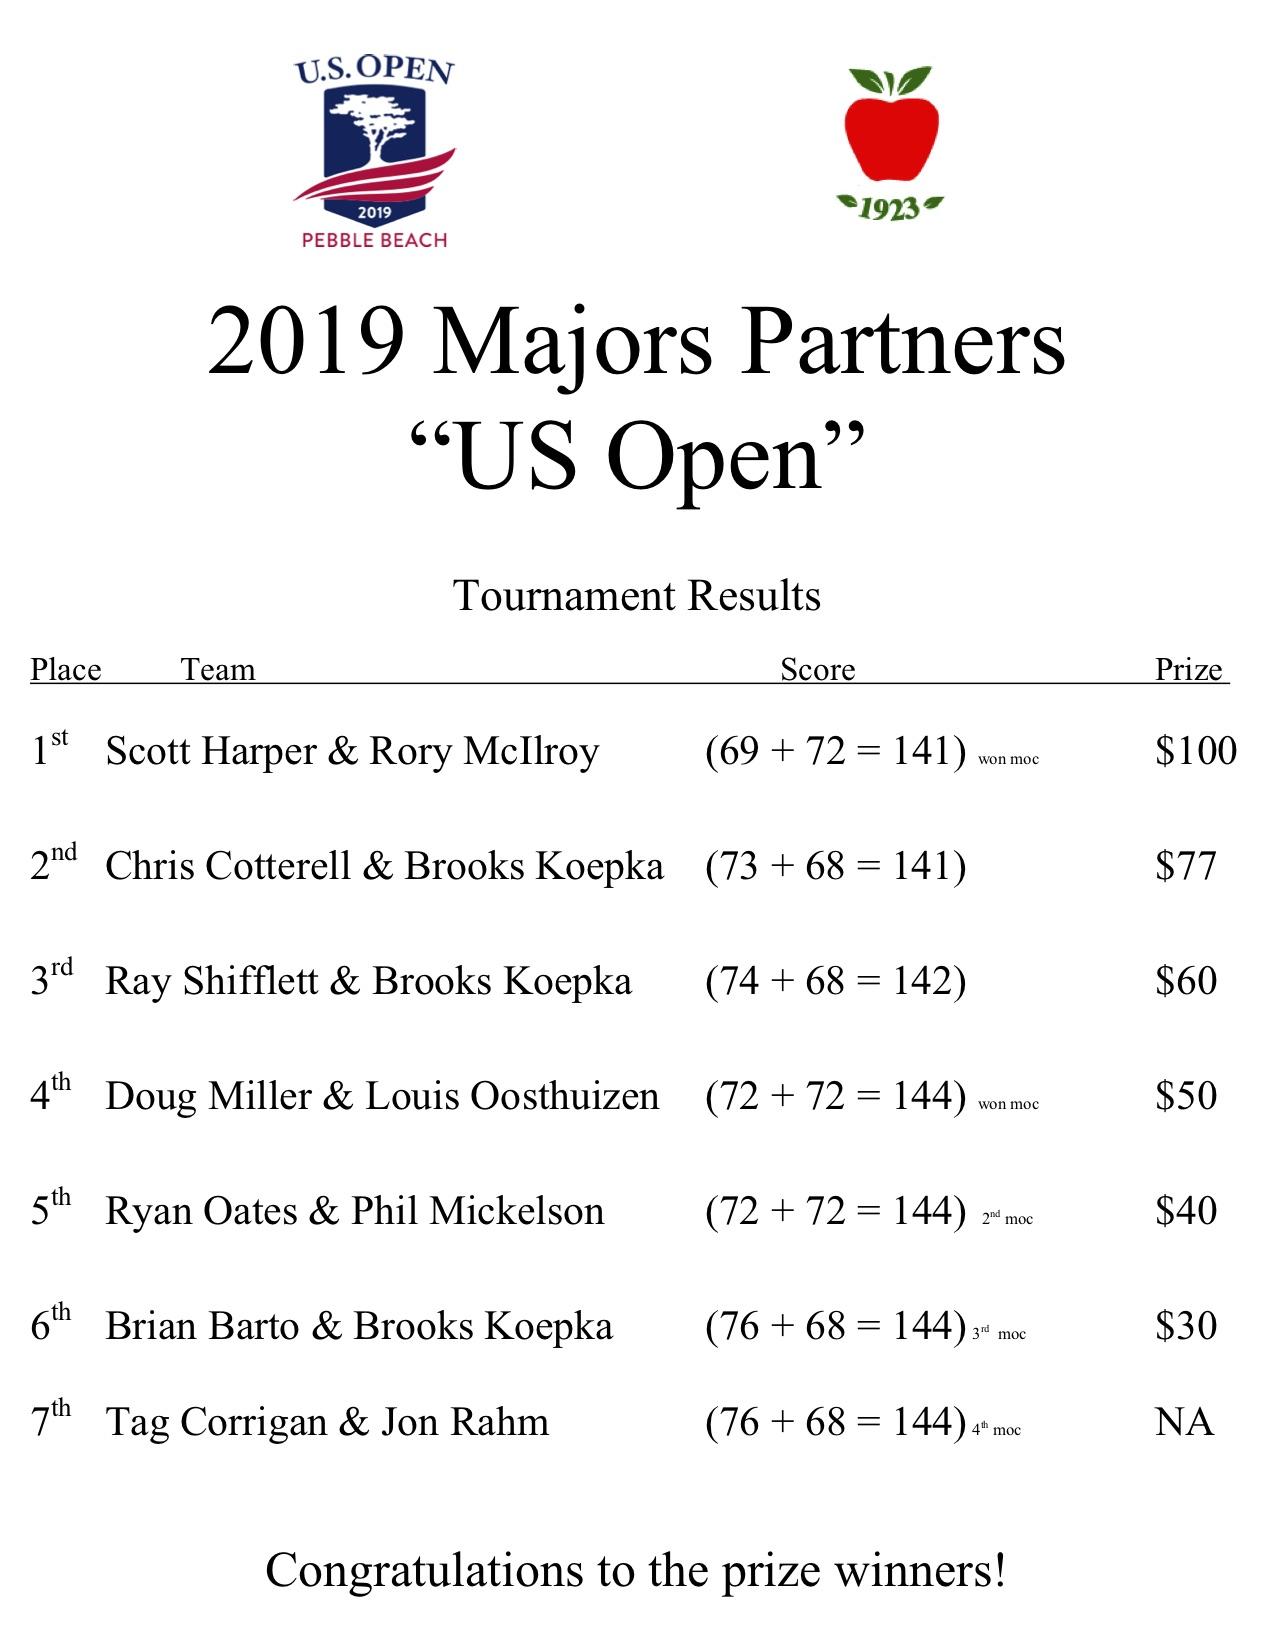 2019 us open partners results.jpg